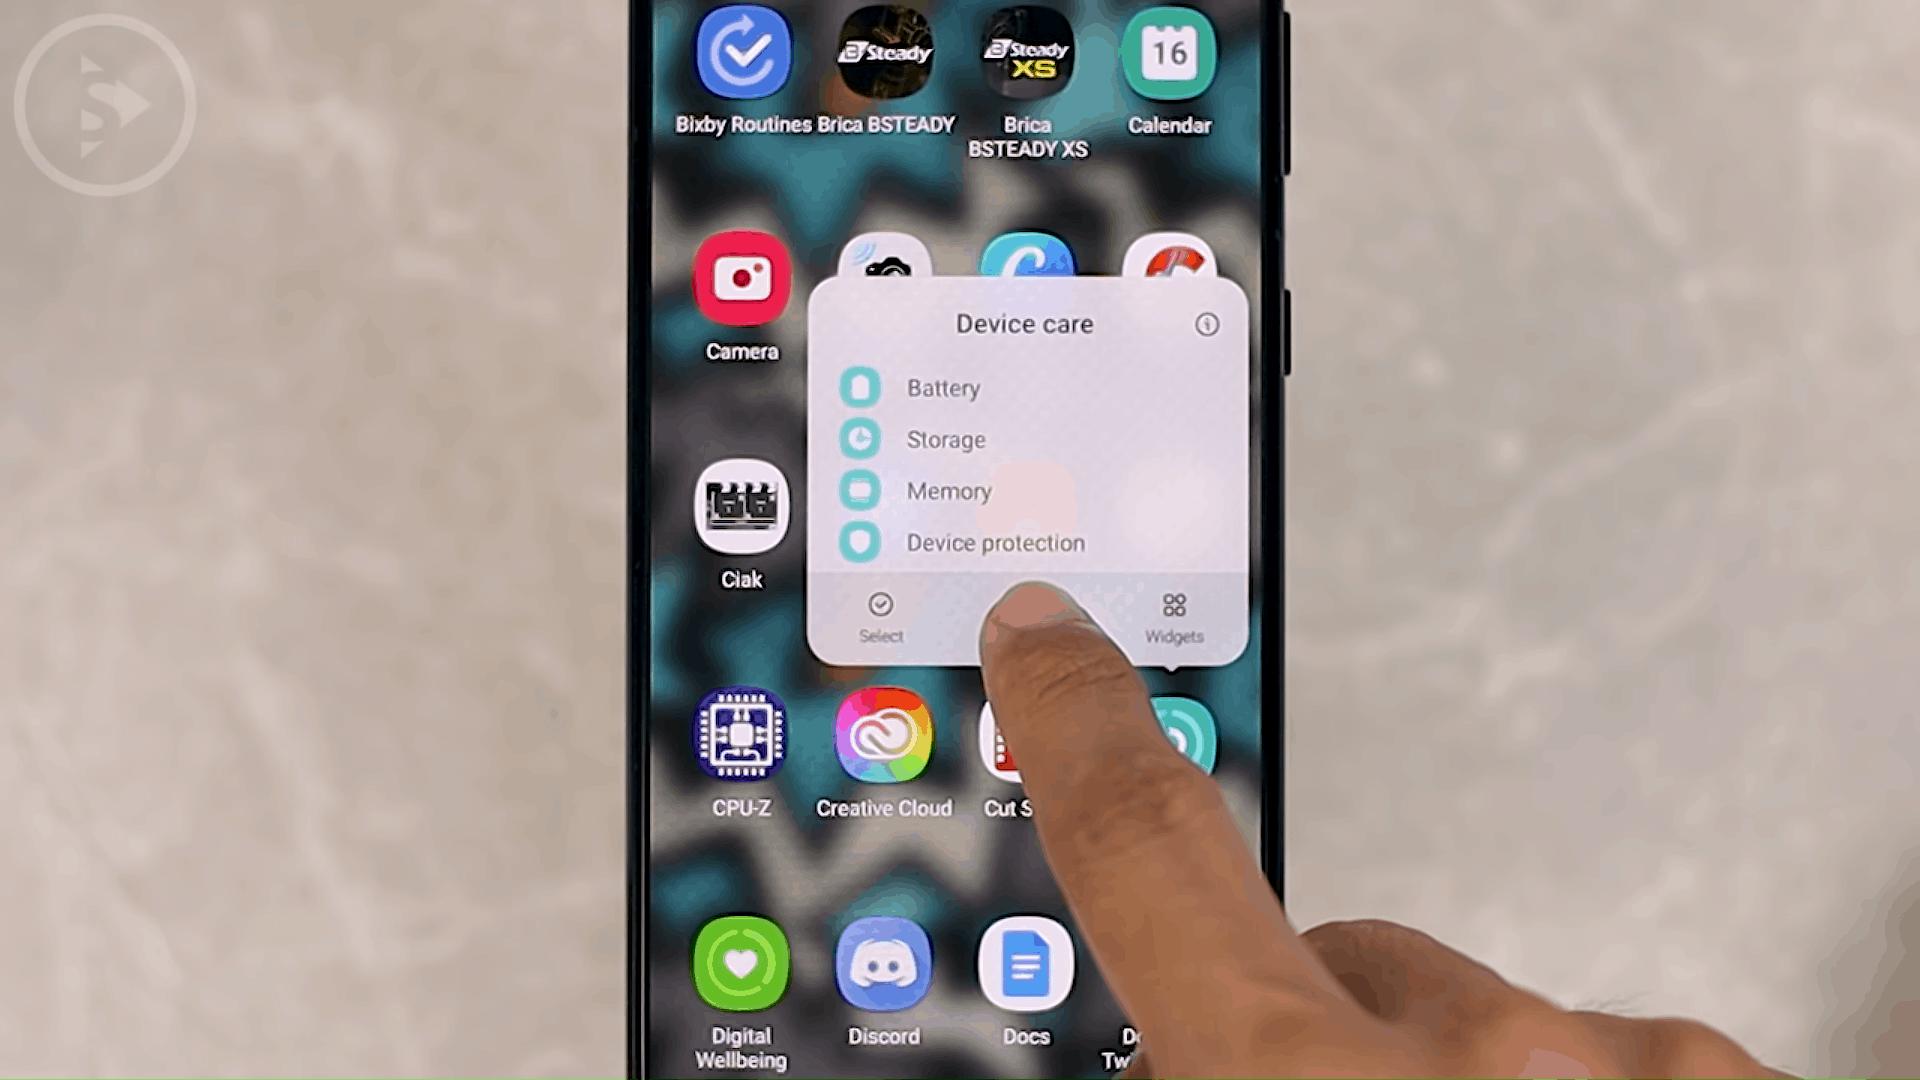 Add Device Care, Digital Wellbeing, and Bixby Routine Shortcuts on Homescreen - 8 Fitur Terbaru dan KEREN HP Samsung di One UI 3.0 dan One UI 3.1